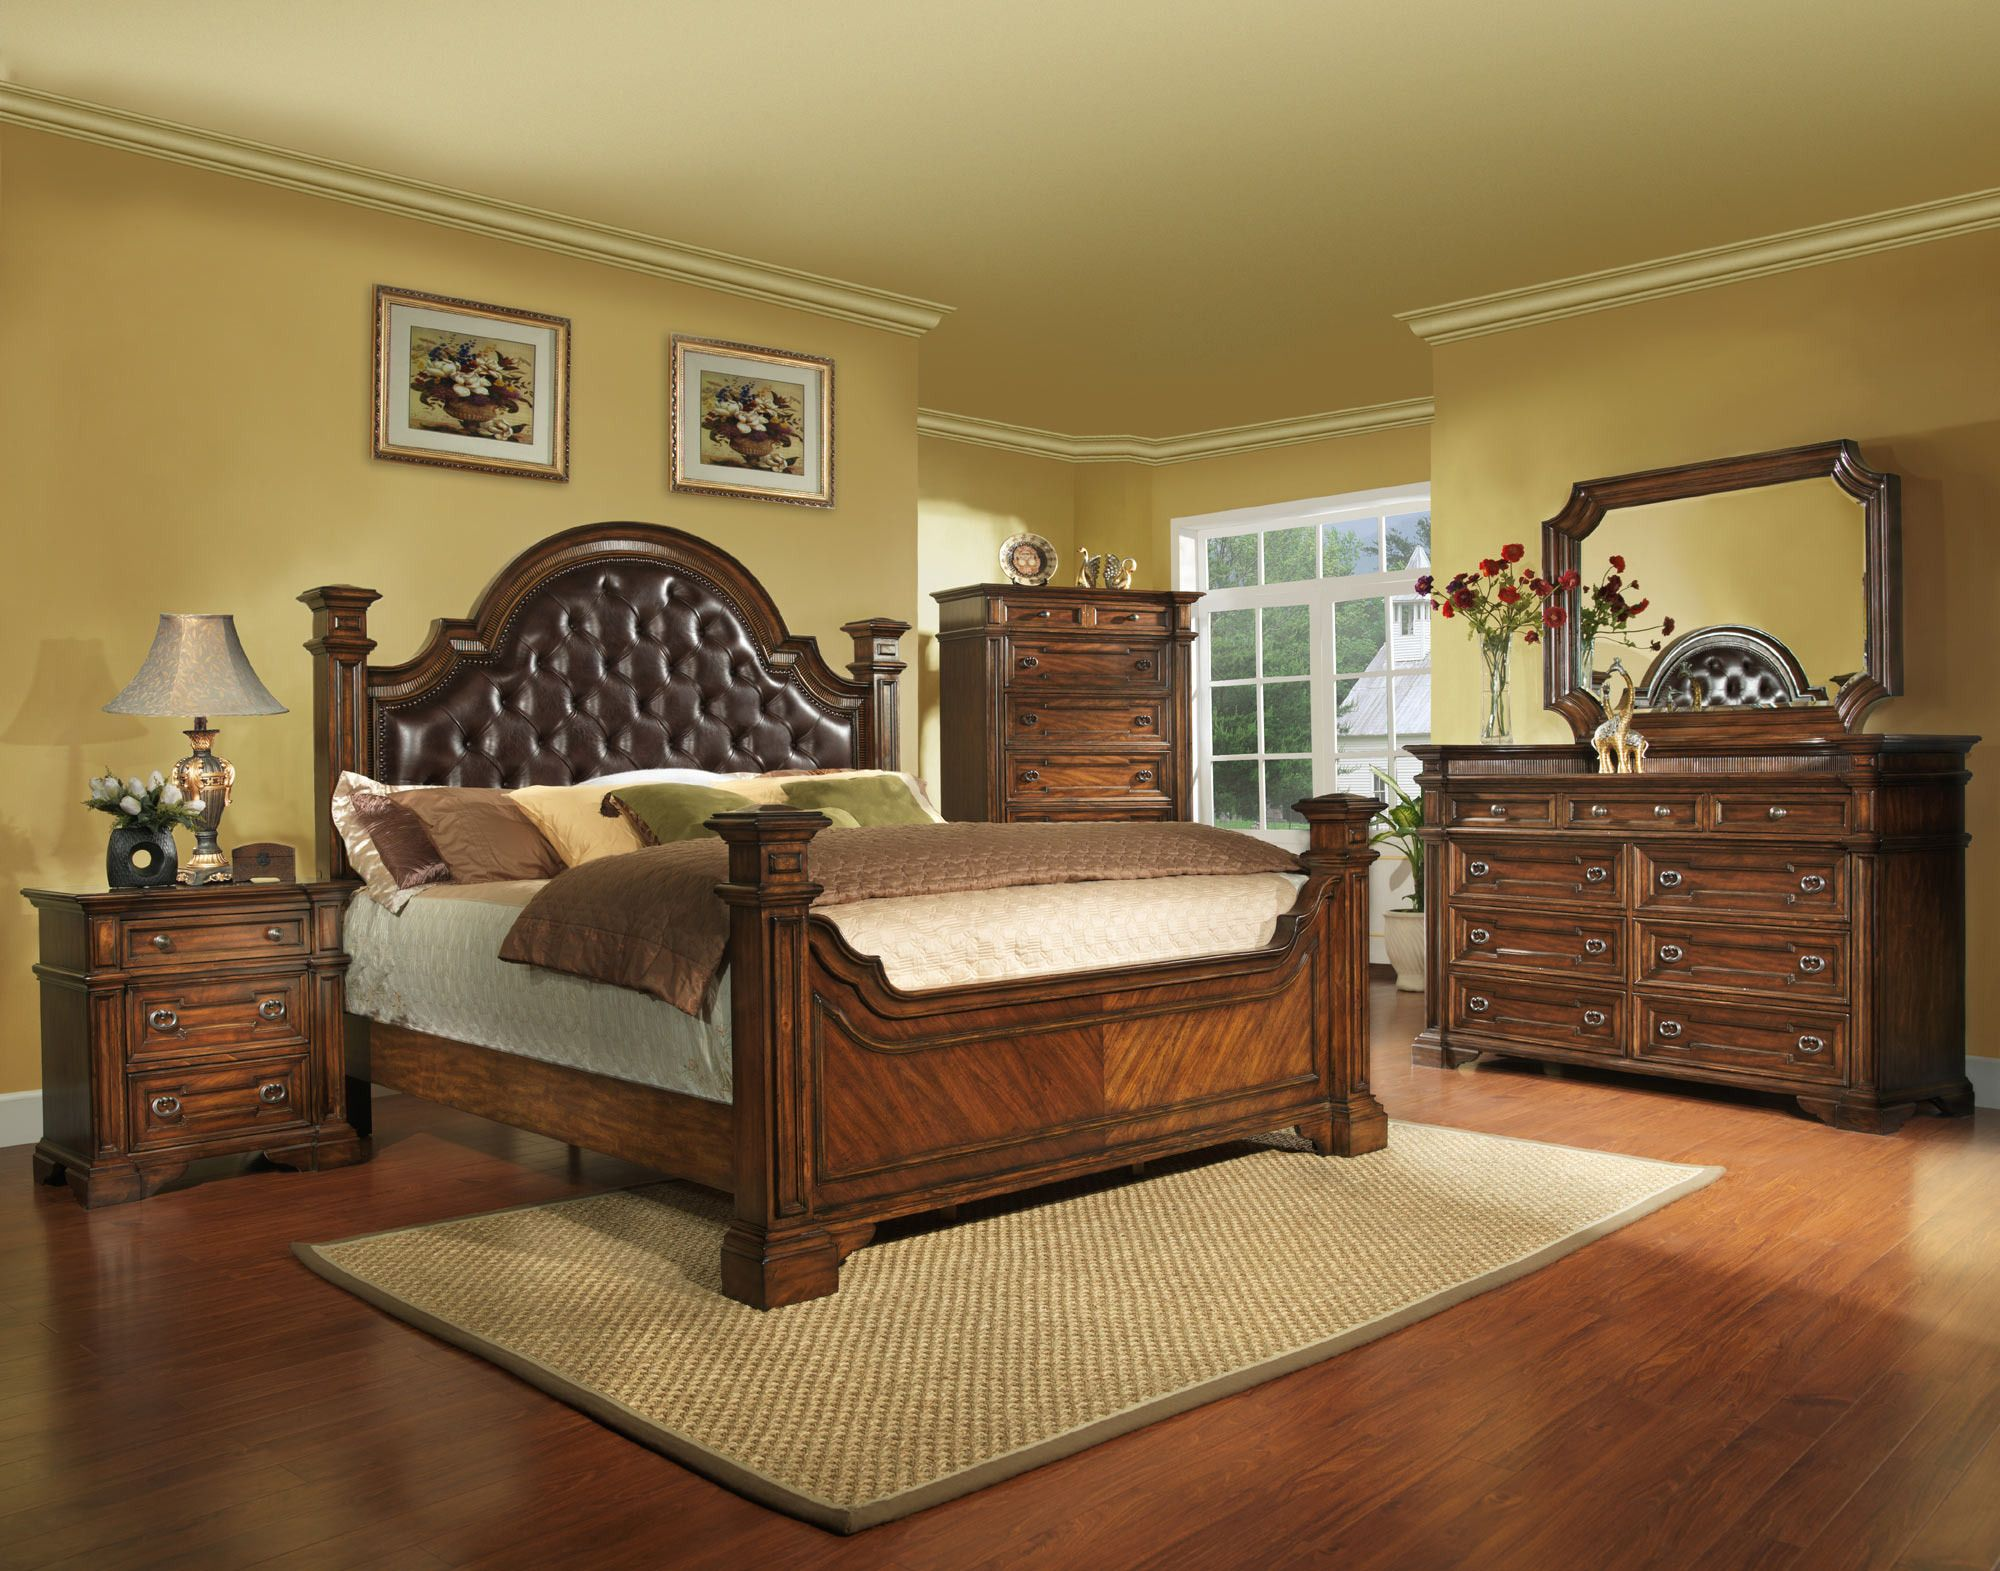 Highland ridge upholstered bedroom set avalon furniture home